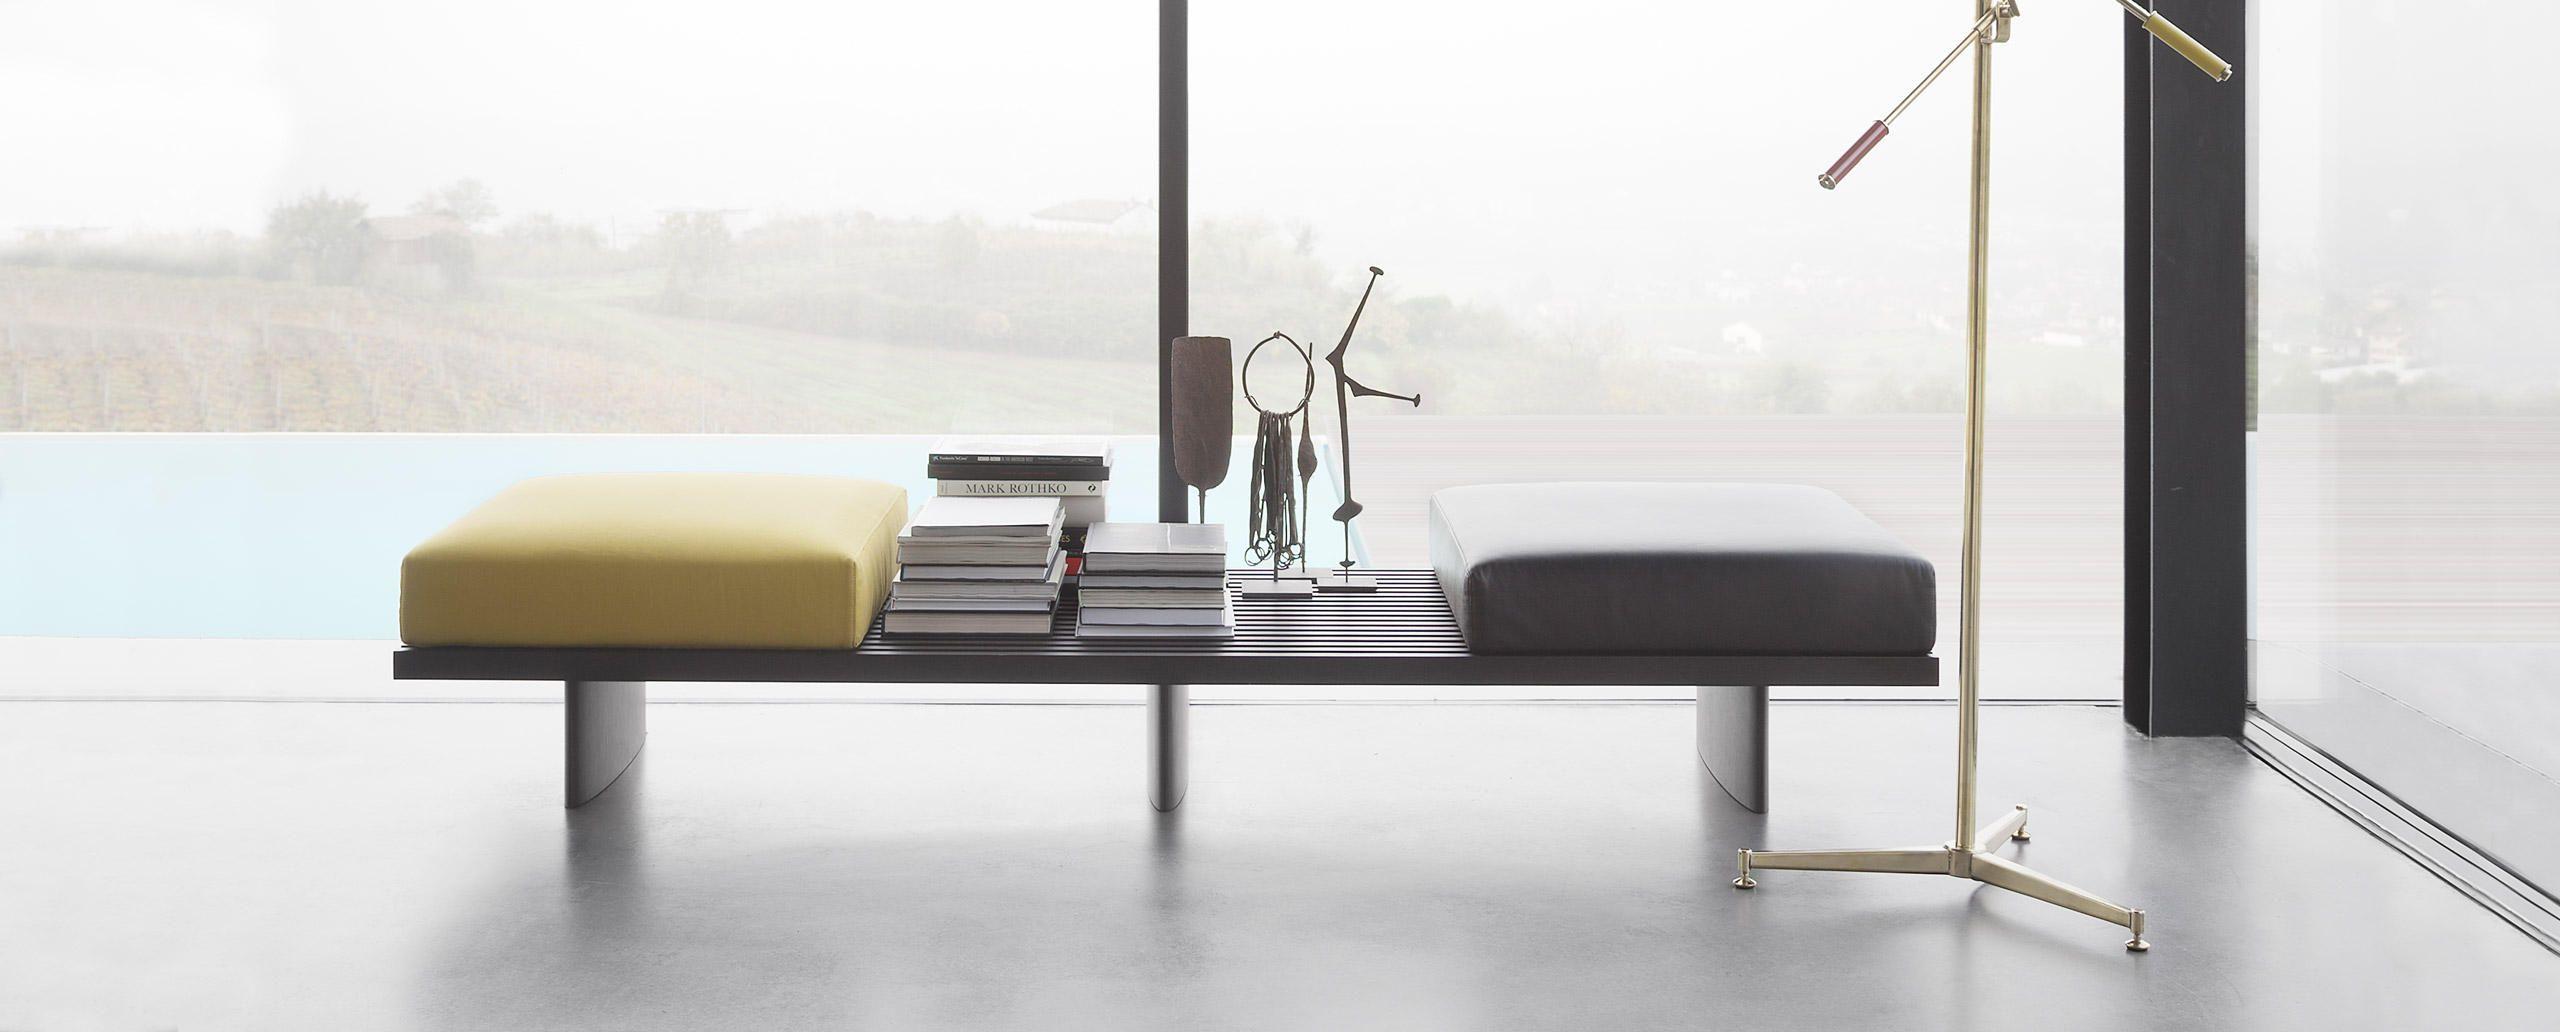 47786e2e8125efcf48027b4448893215 Incroyable De Table Basse Le Corbusier Concept